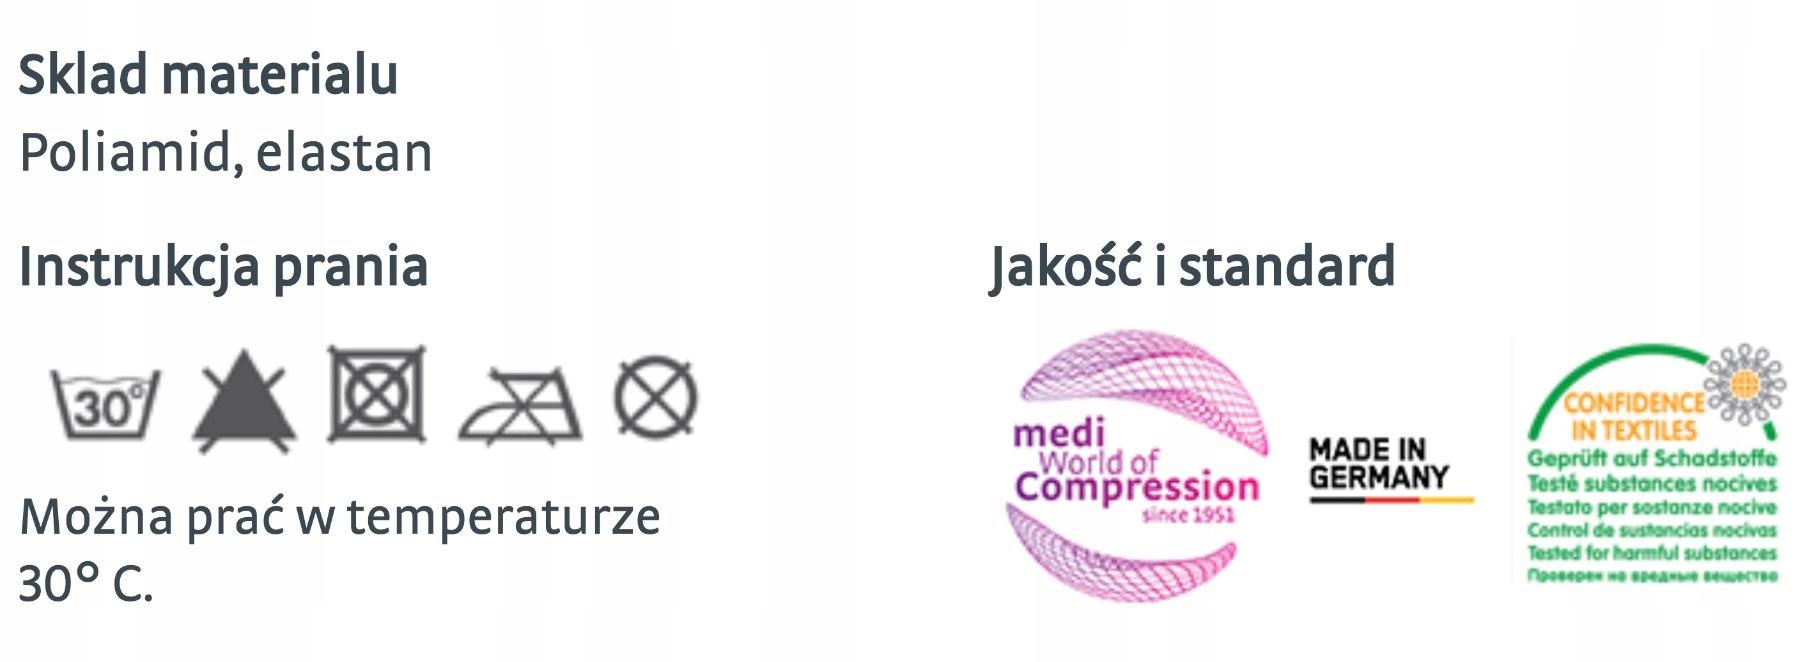 Opaska elastyczna na kolano kompresja medyczna 2st Rozmiar XXS